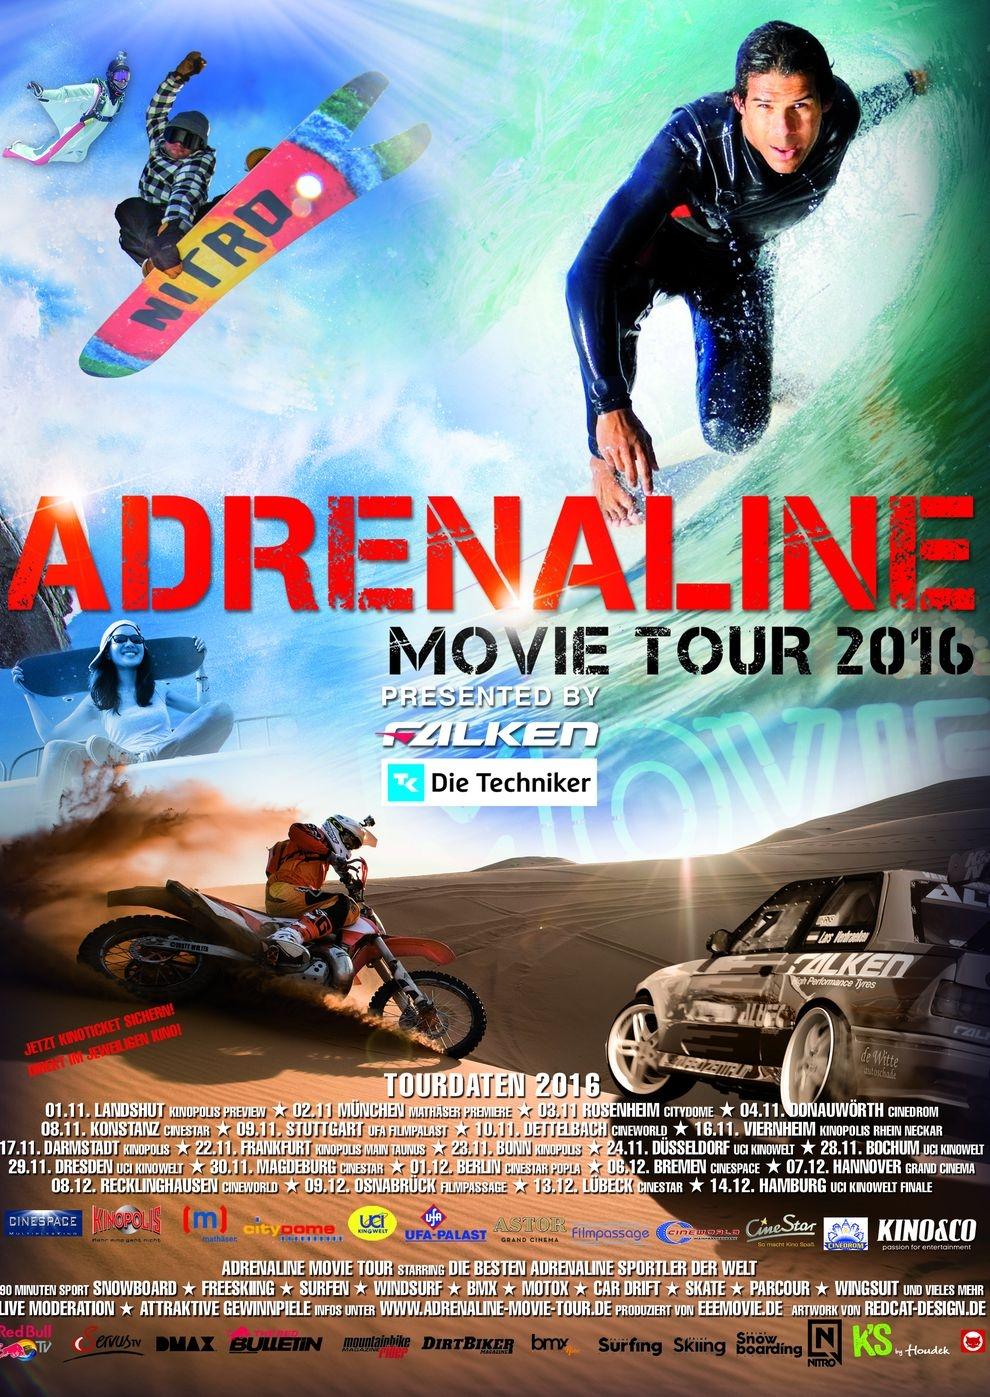 Adrenaline Movie Tour 2016 (Poster)